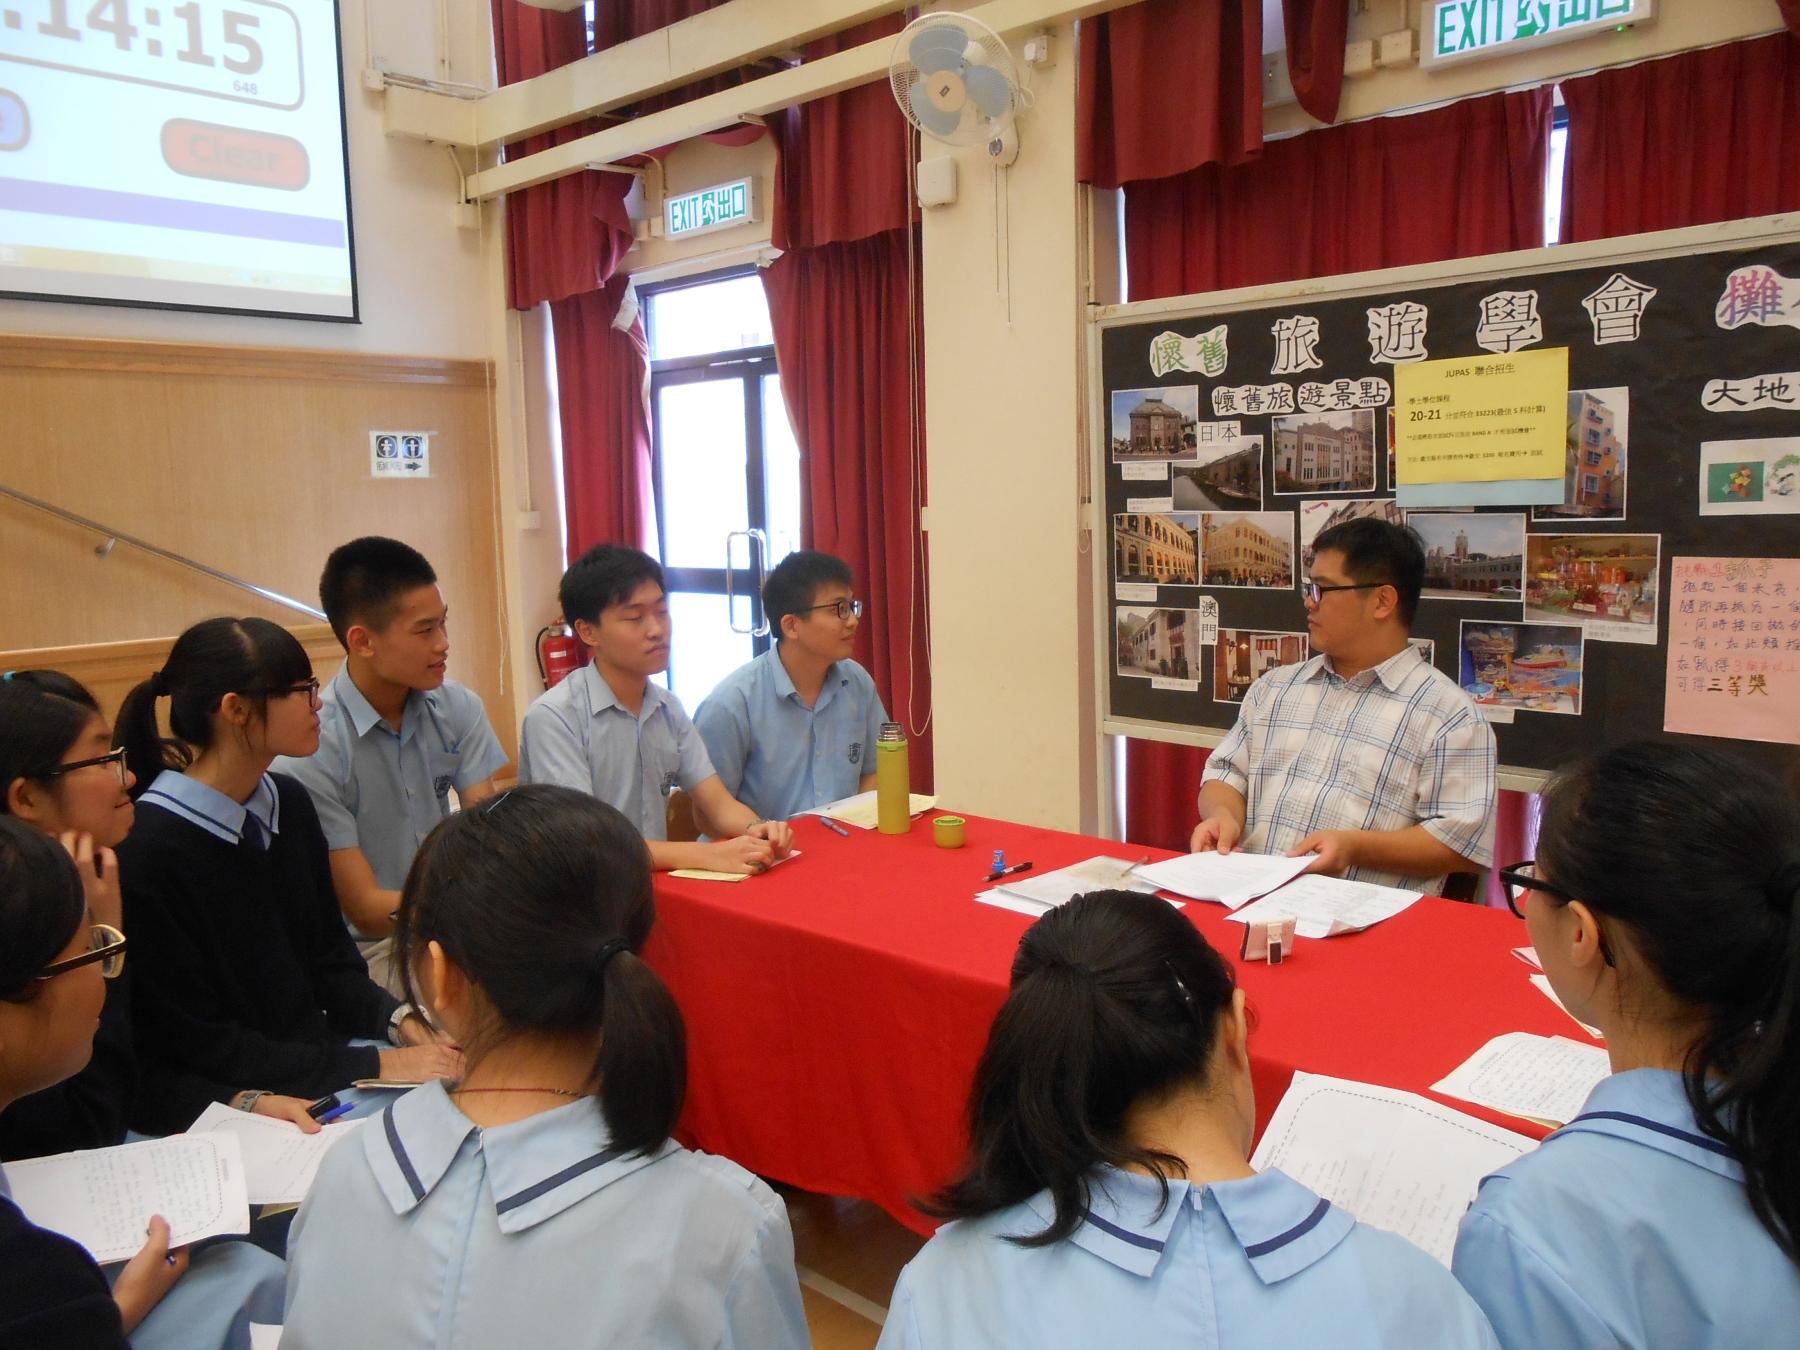 http://www.npc.edu.hk/sites/default/files/dscn1197.jpg